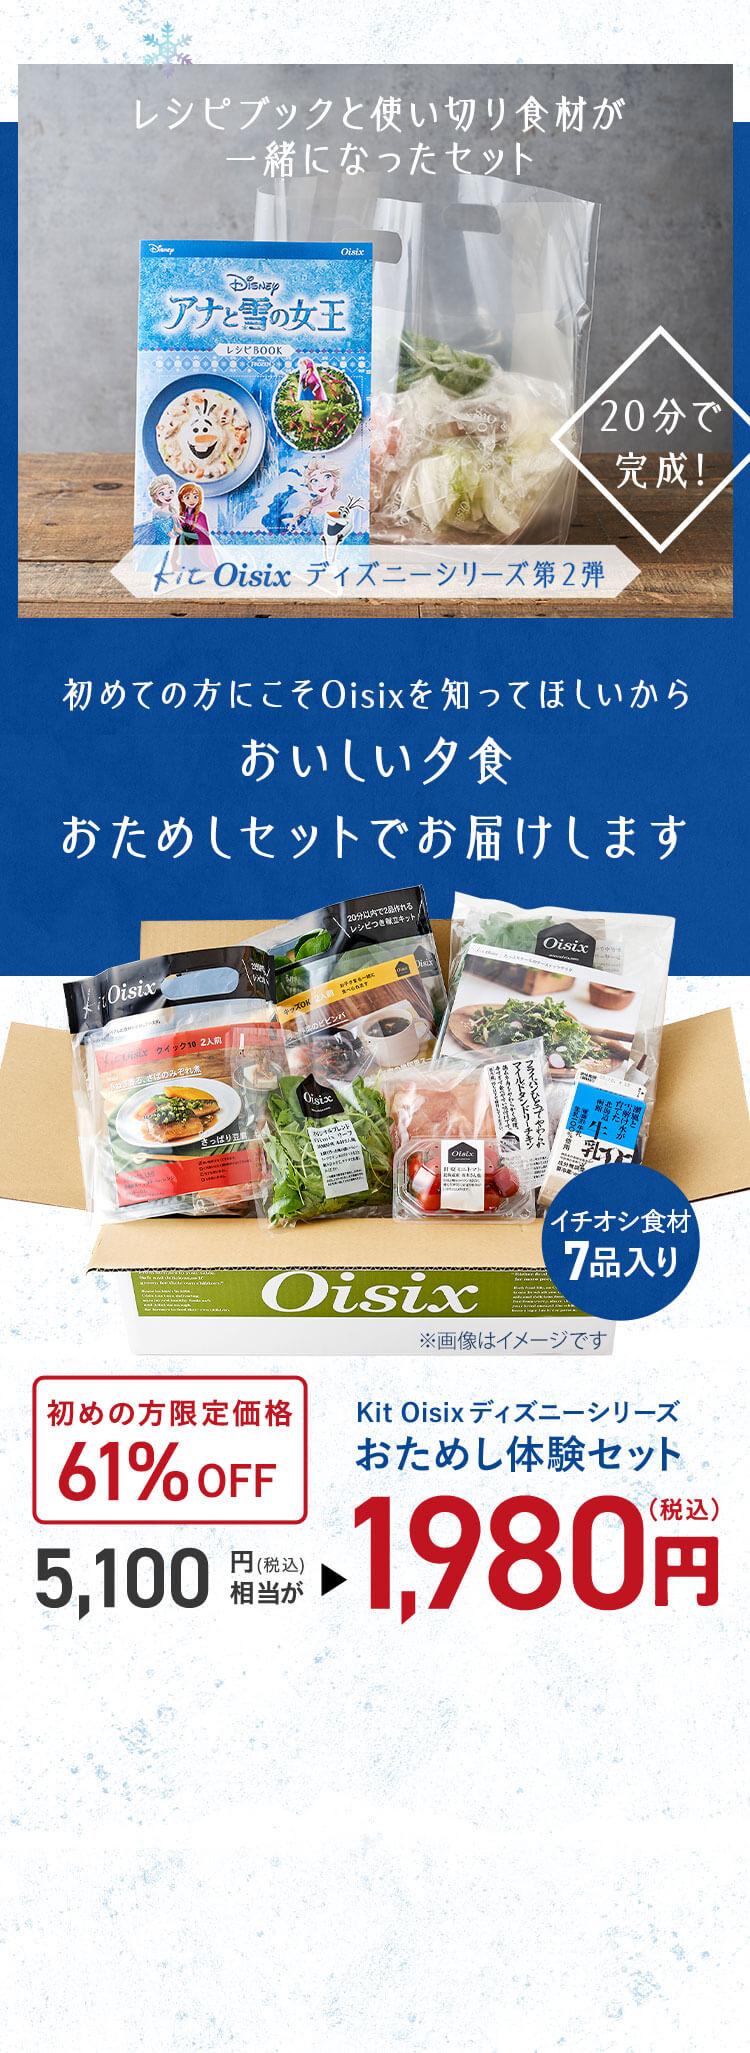 Kit Oisixディズニーシリーズおためし体験セット〈アナと雪の女王〉 Kit Oisixディズニーシリーズ第2弾1,980円